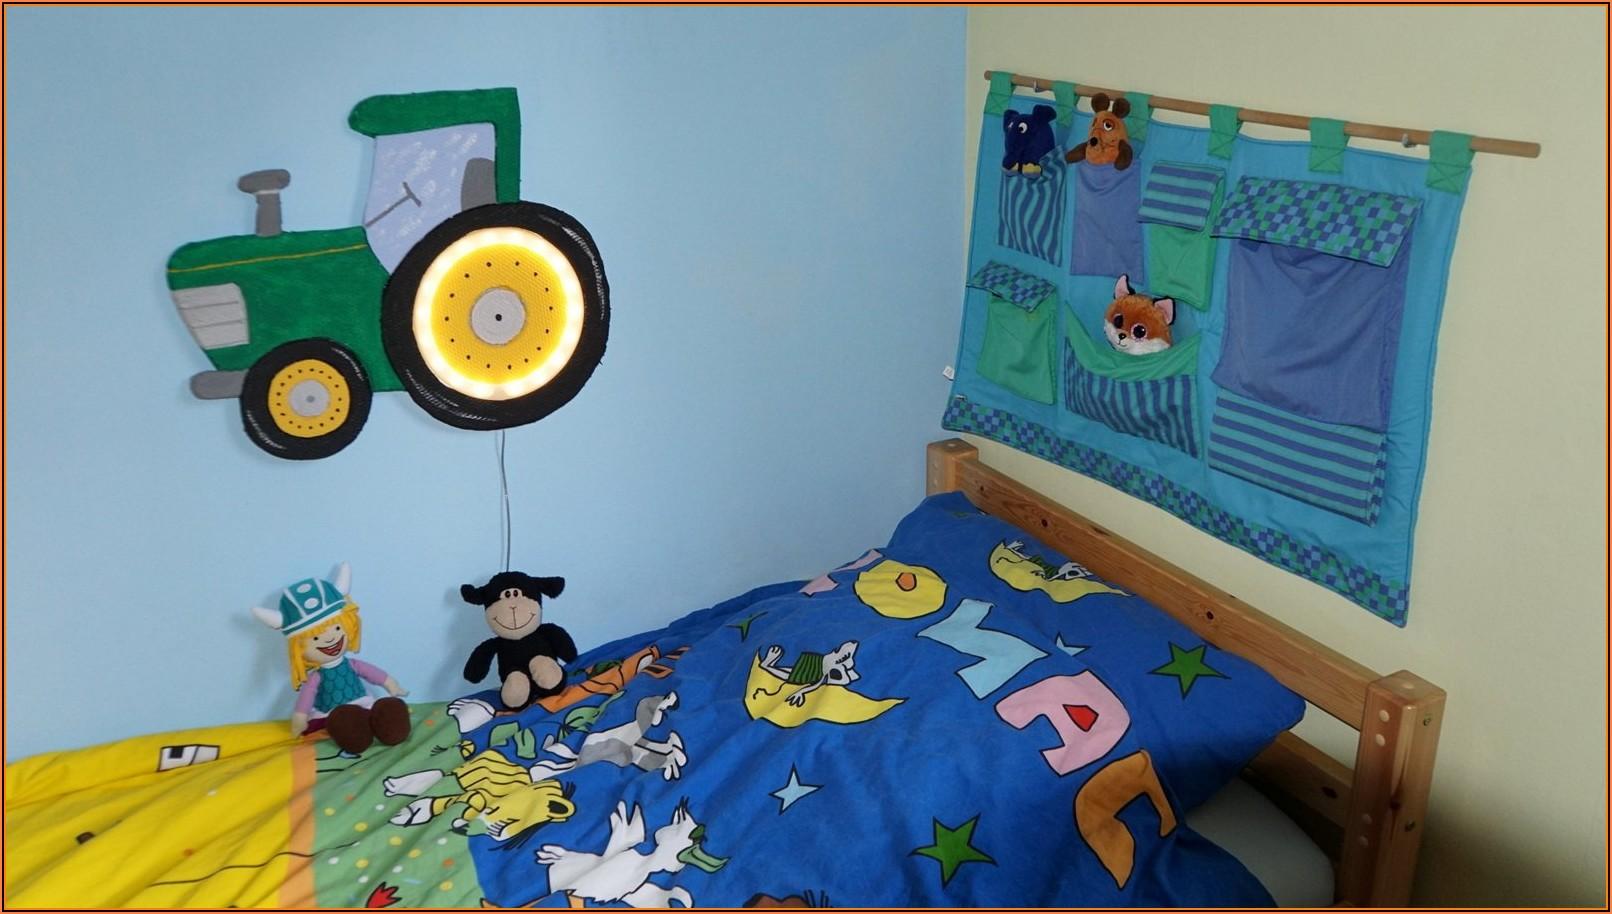 Kinderzimmer 7 Jährige